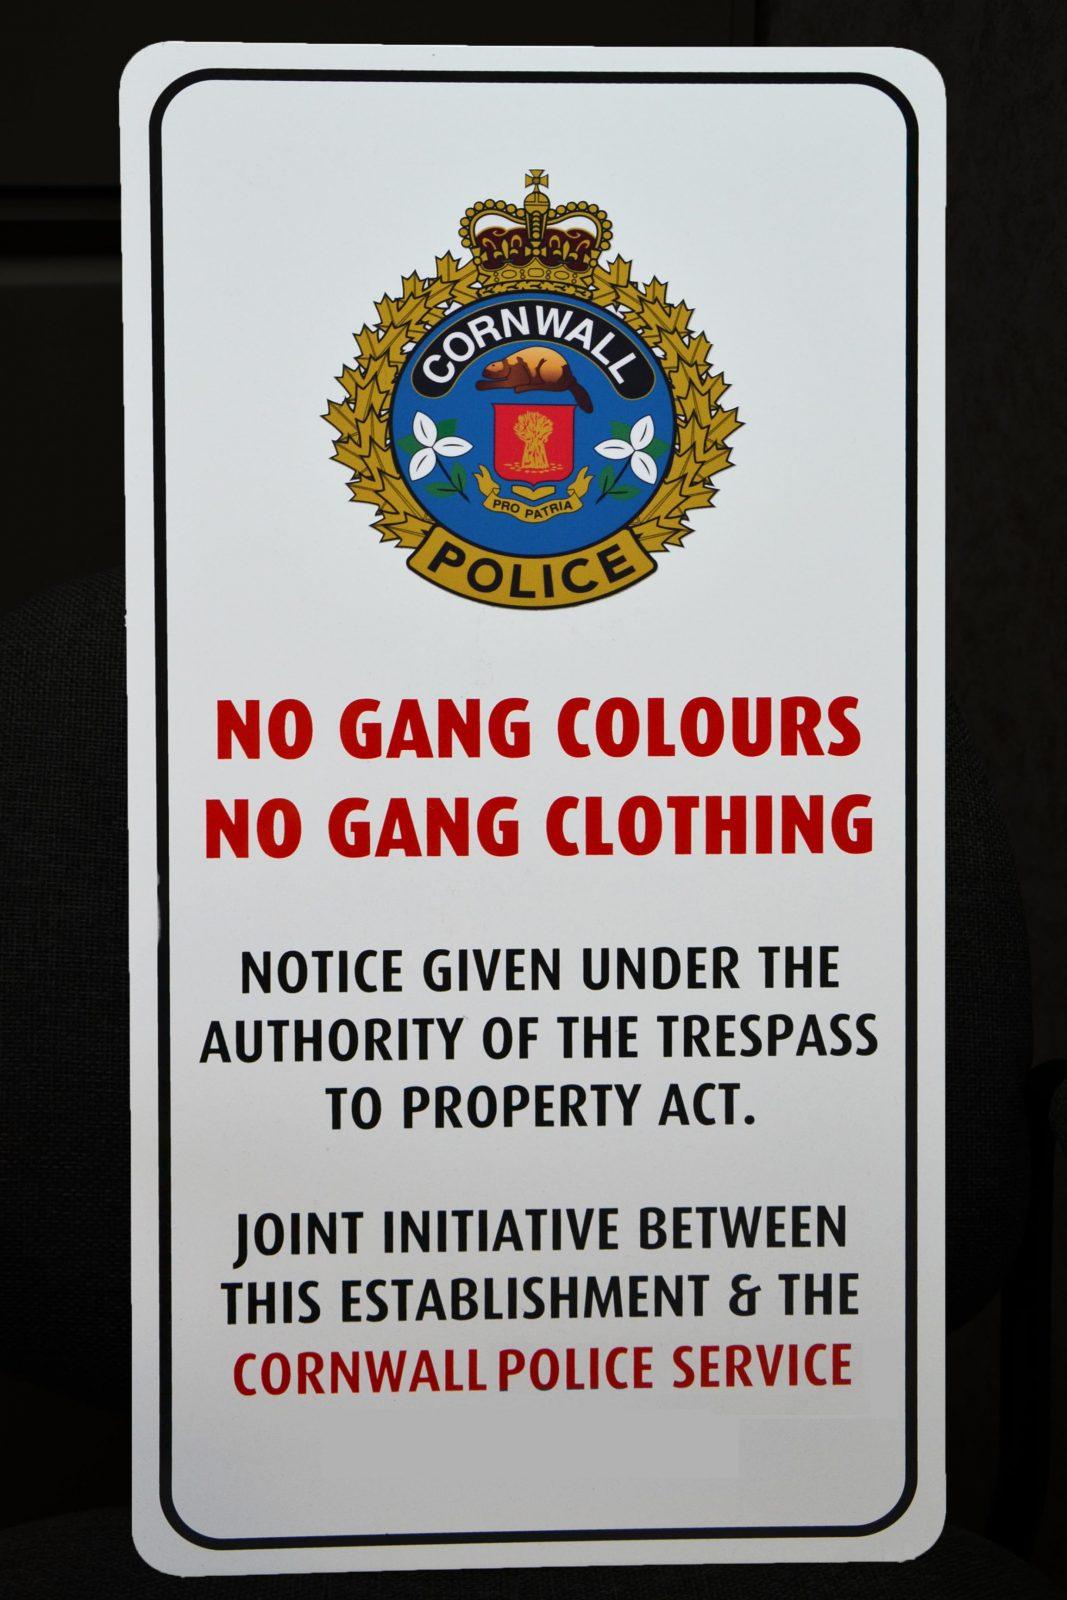 CPS launches No Gang Colours, No Gang Clothing program